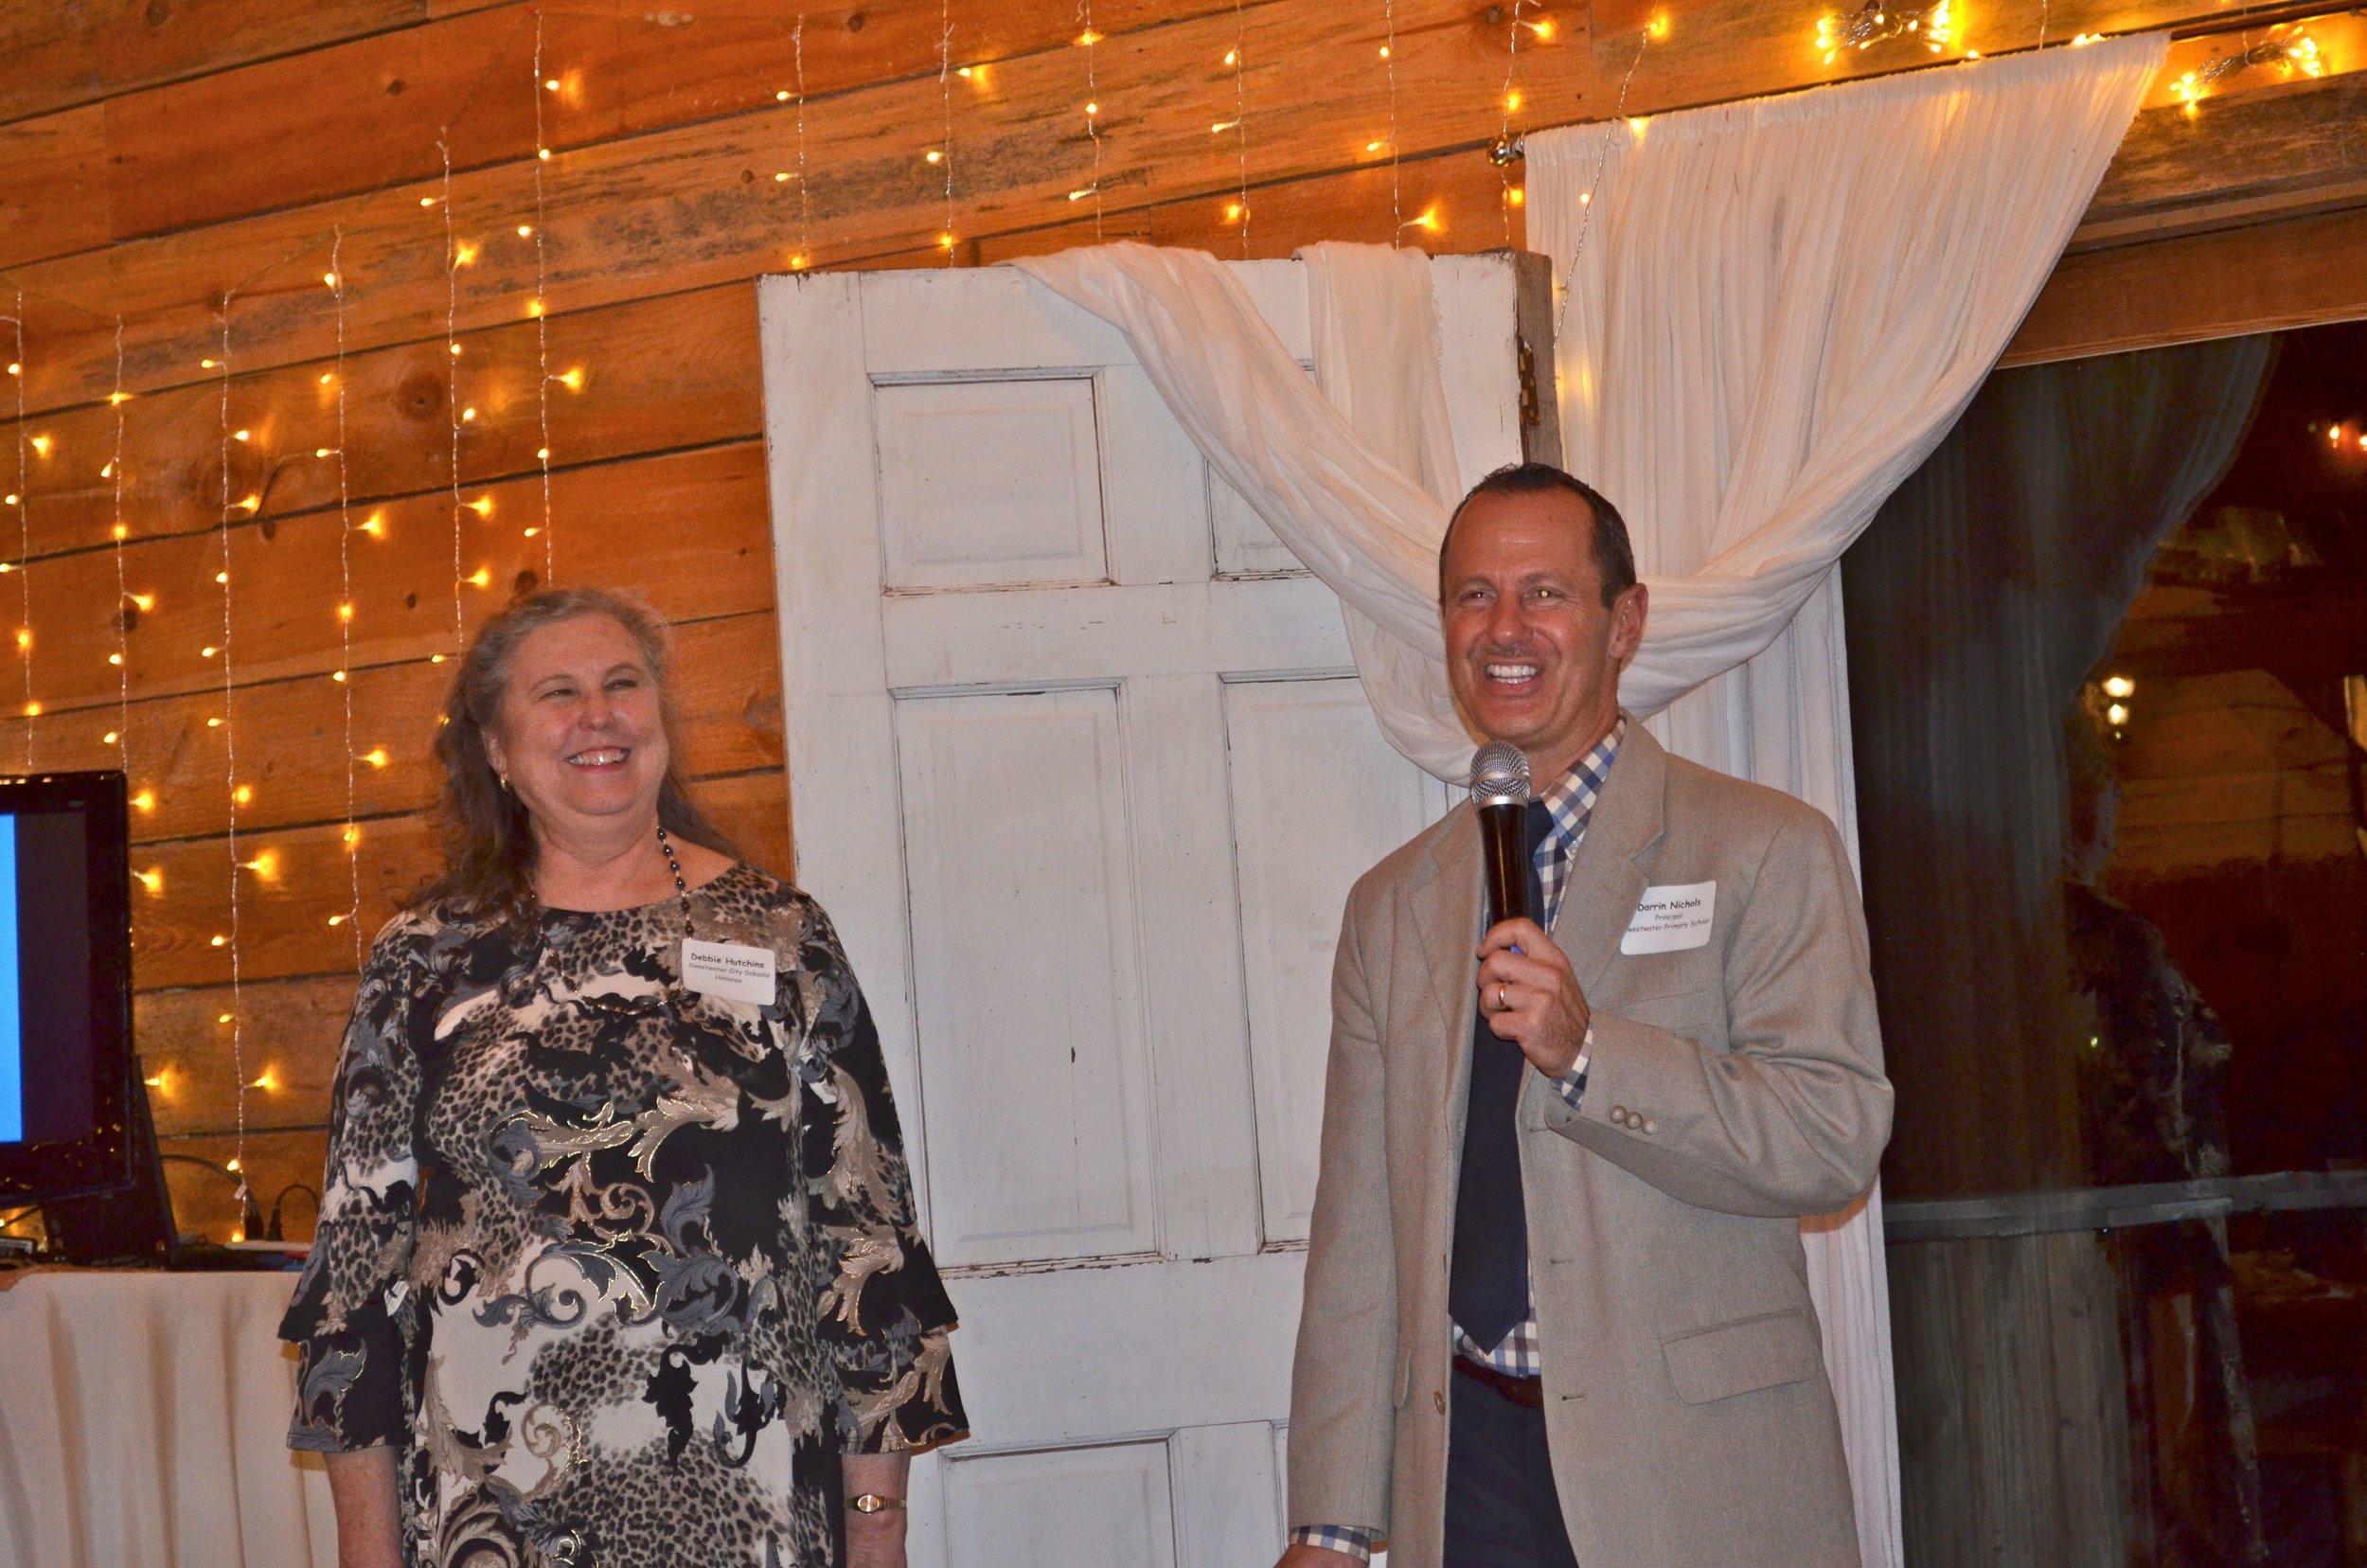 Debbie Hutchins and Darrin Nichols